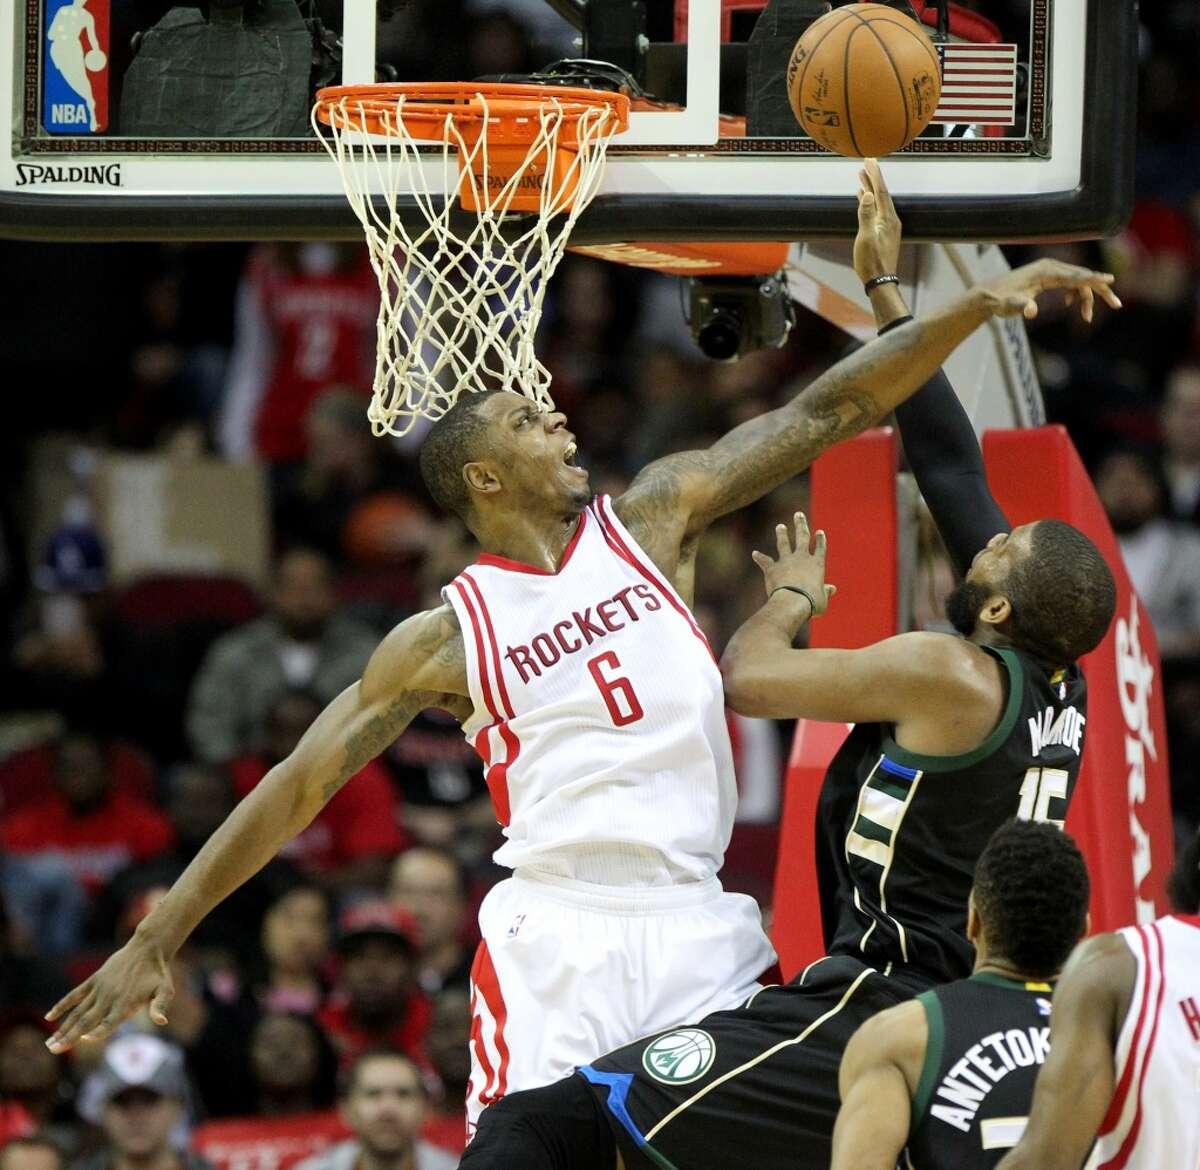 Houston Rockets forward Terrence Jones (6) blocks the shot of Milwaukee Bucks center Greg Monroe (15) during the second quarter at the Toyota Center Friday, Jan. 22, 2016, in Houston, Texas. ( Gary Coronado / Houston Chronicle )